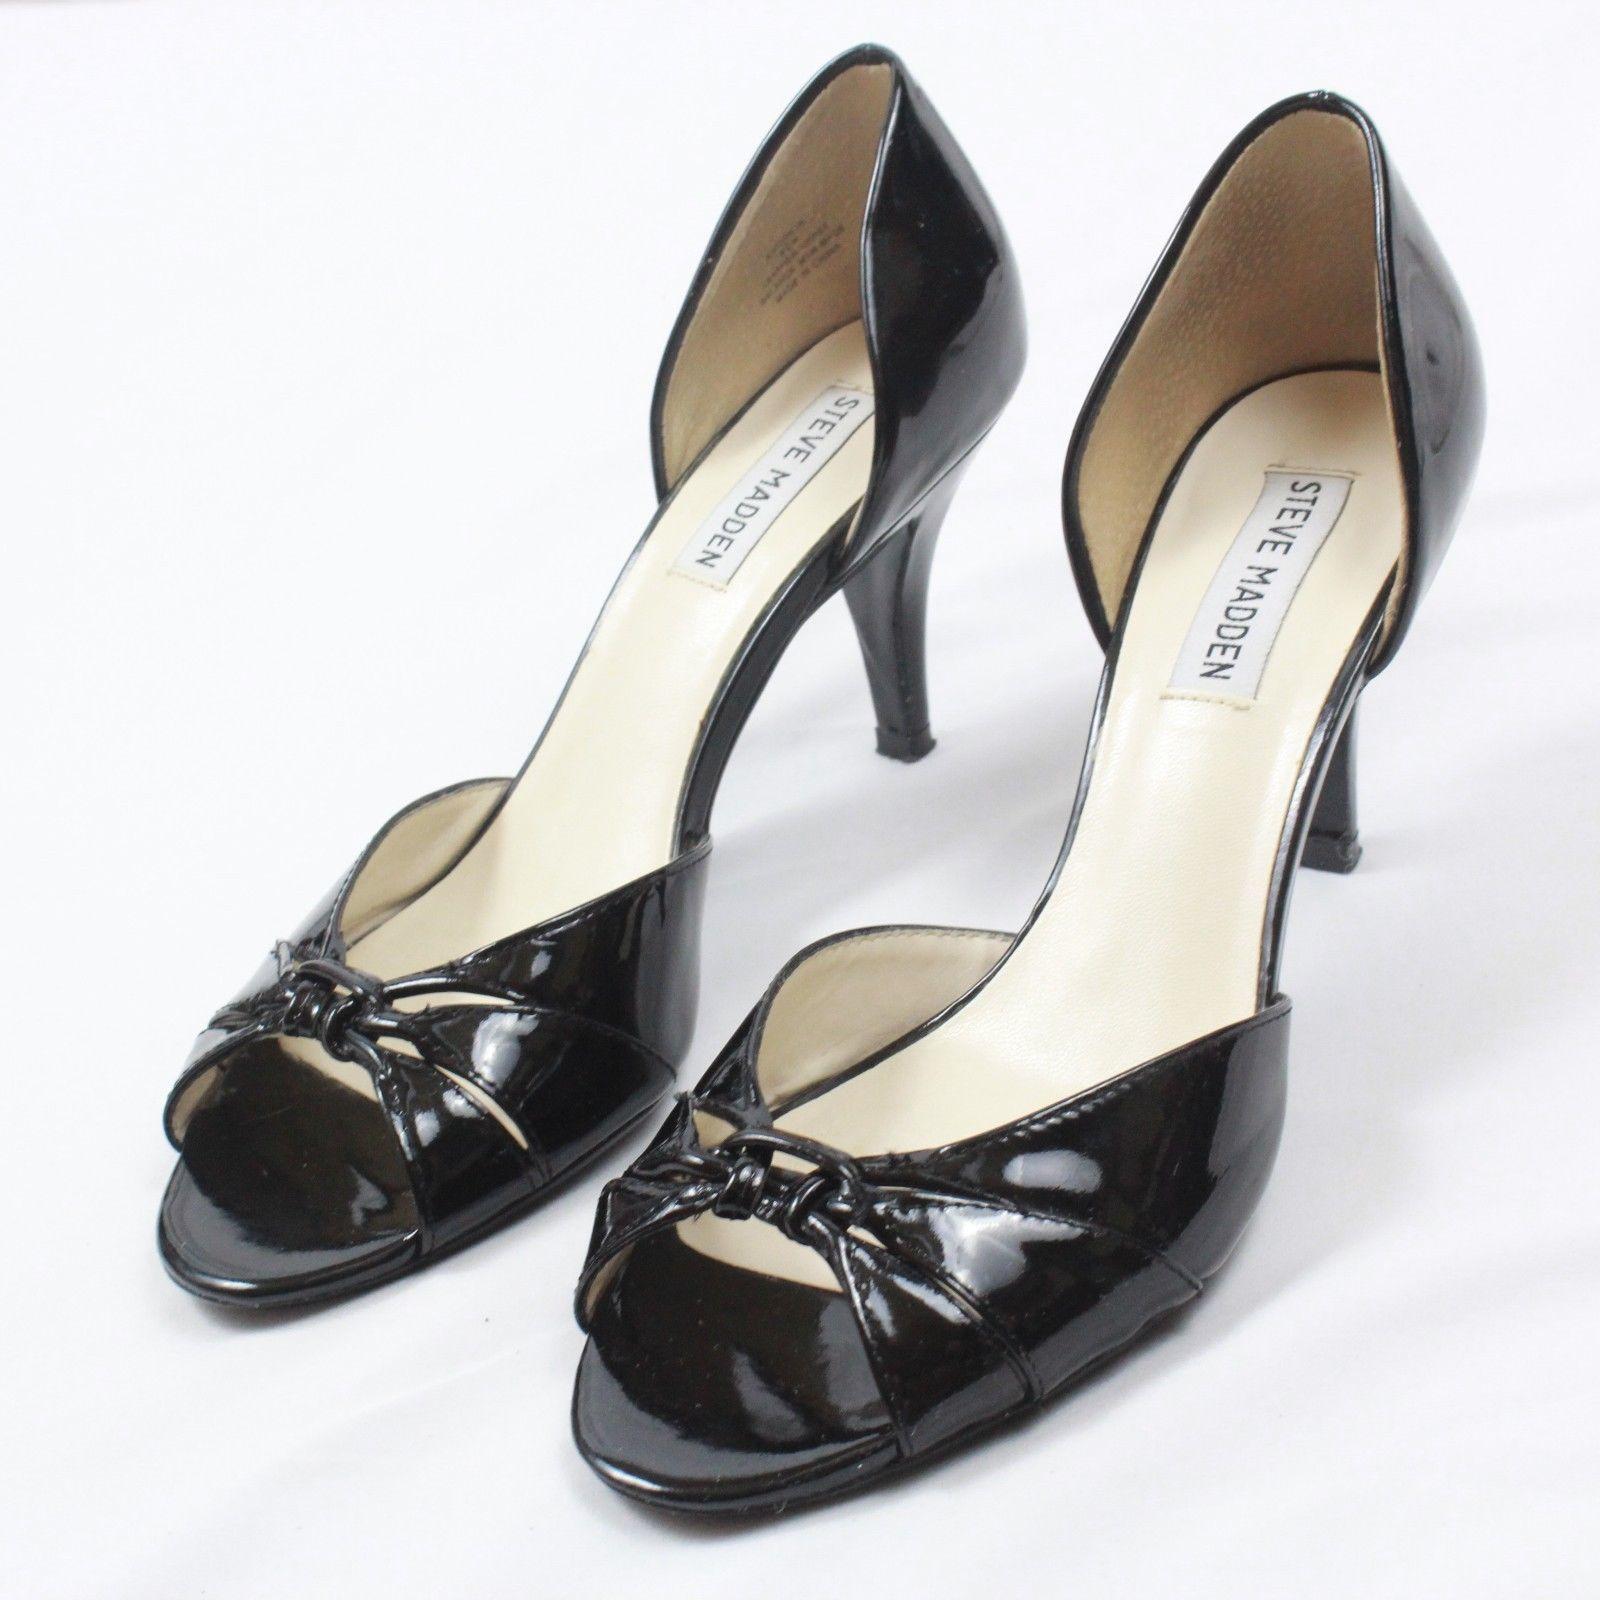 9b6a82e3723 Steve Madden Womens Open Toe Heels Patent and 50 similar items